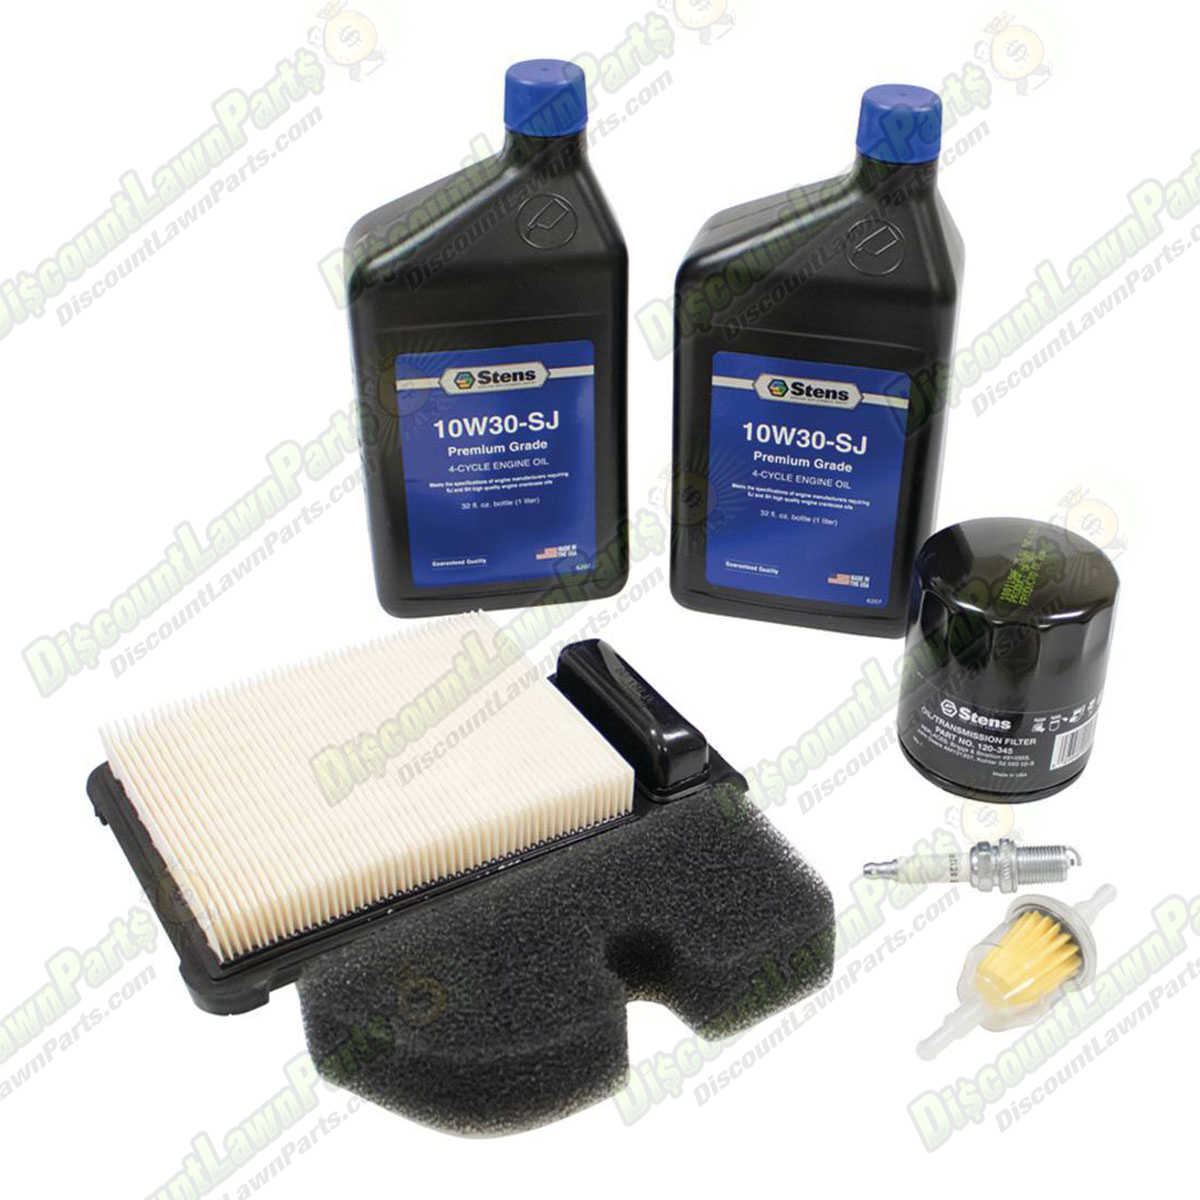 Engine Maintenance Kit / Kohler 20 789 01-S Replacement Engine Maintenance  Kit / Stens 785-592